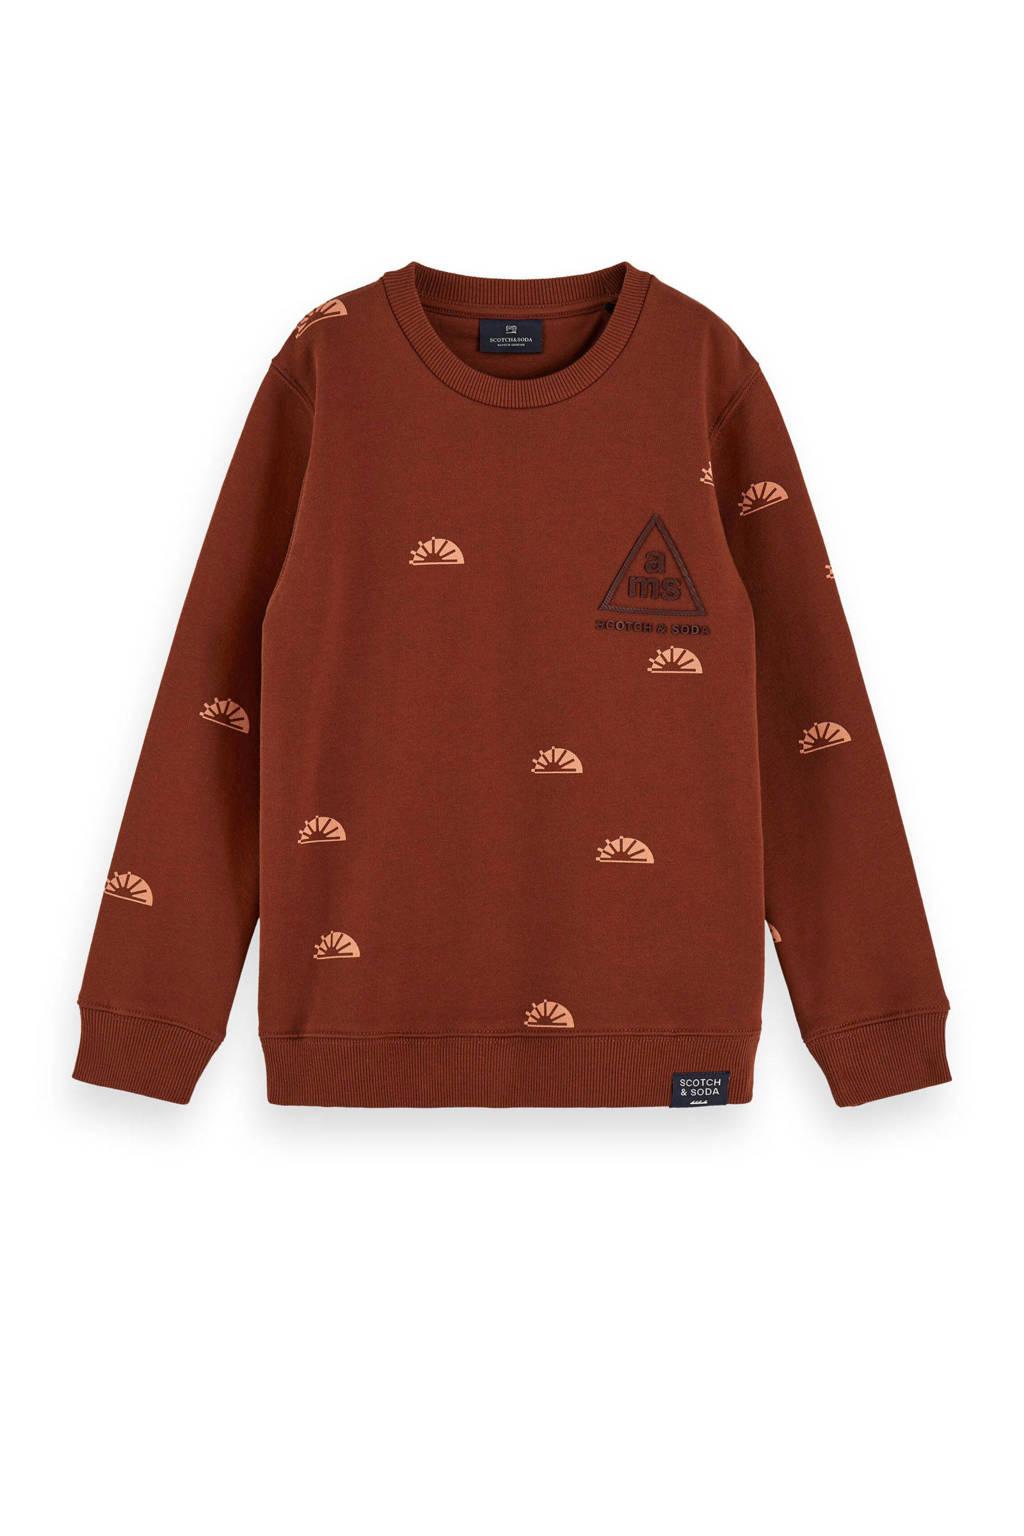 Scotch & Soda sweater met all over print bruin, Bruin